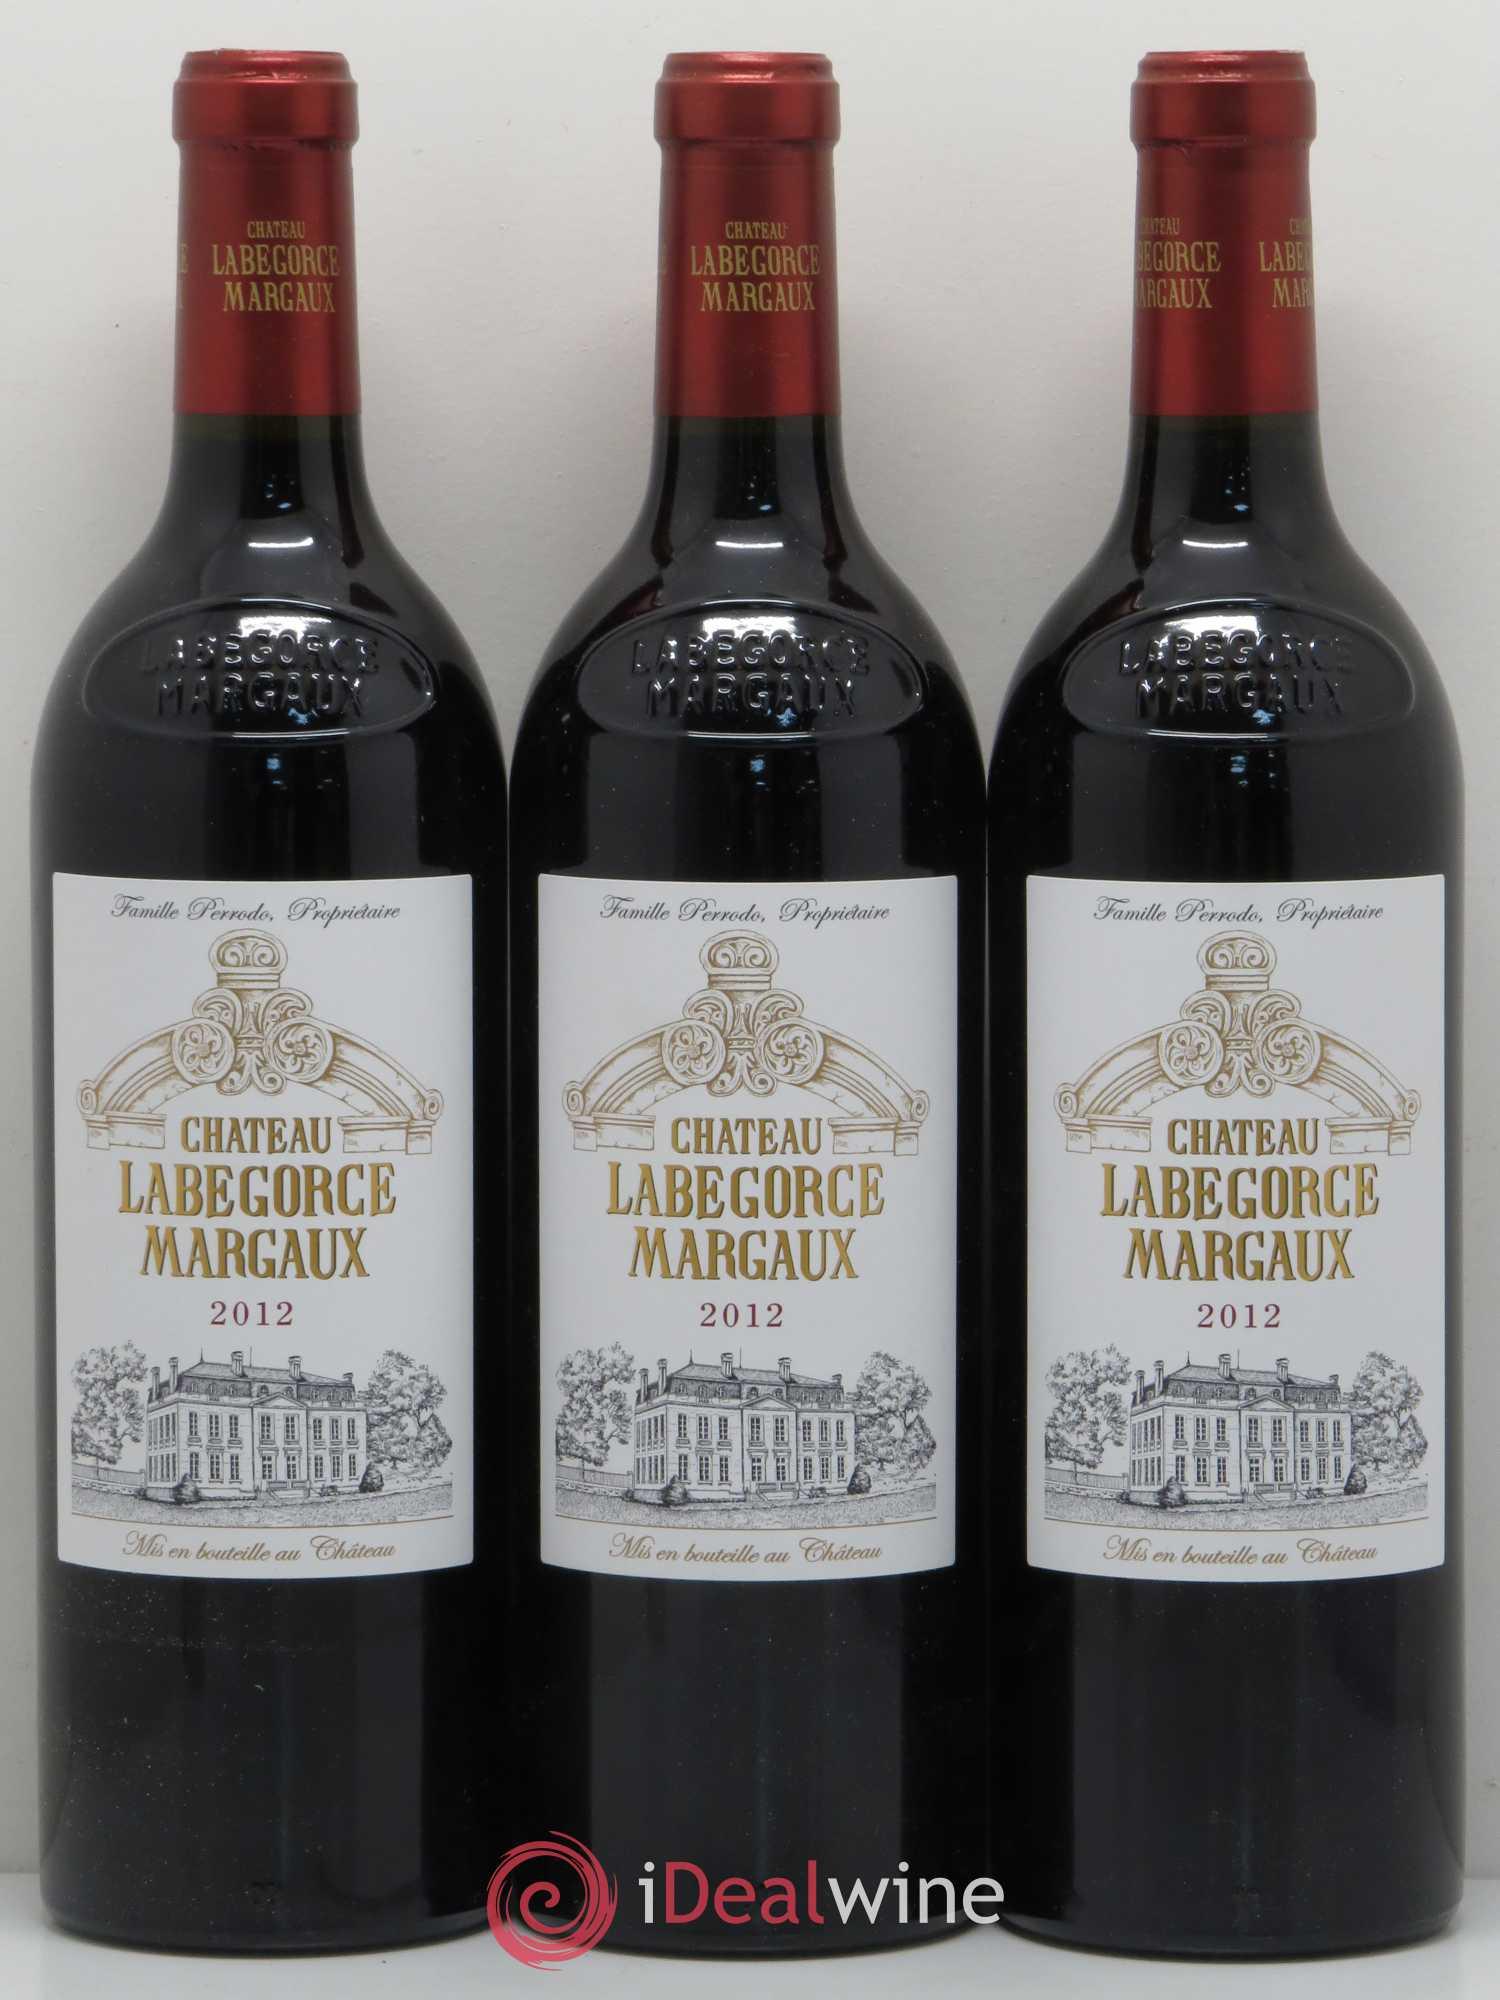 Kết quả hình ảnh cho chateau labegorce margaux 2012